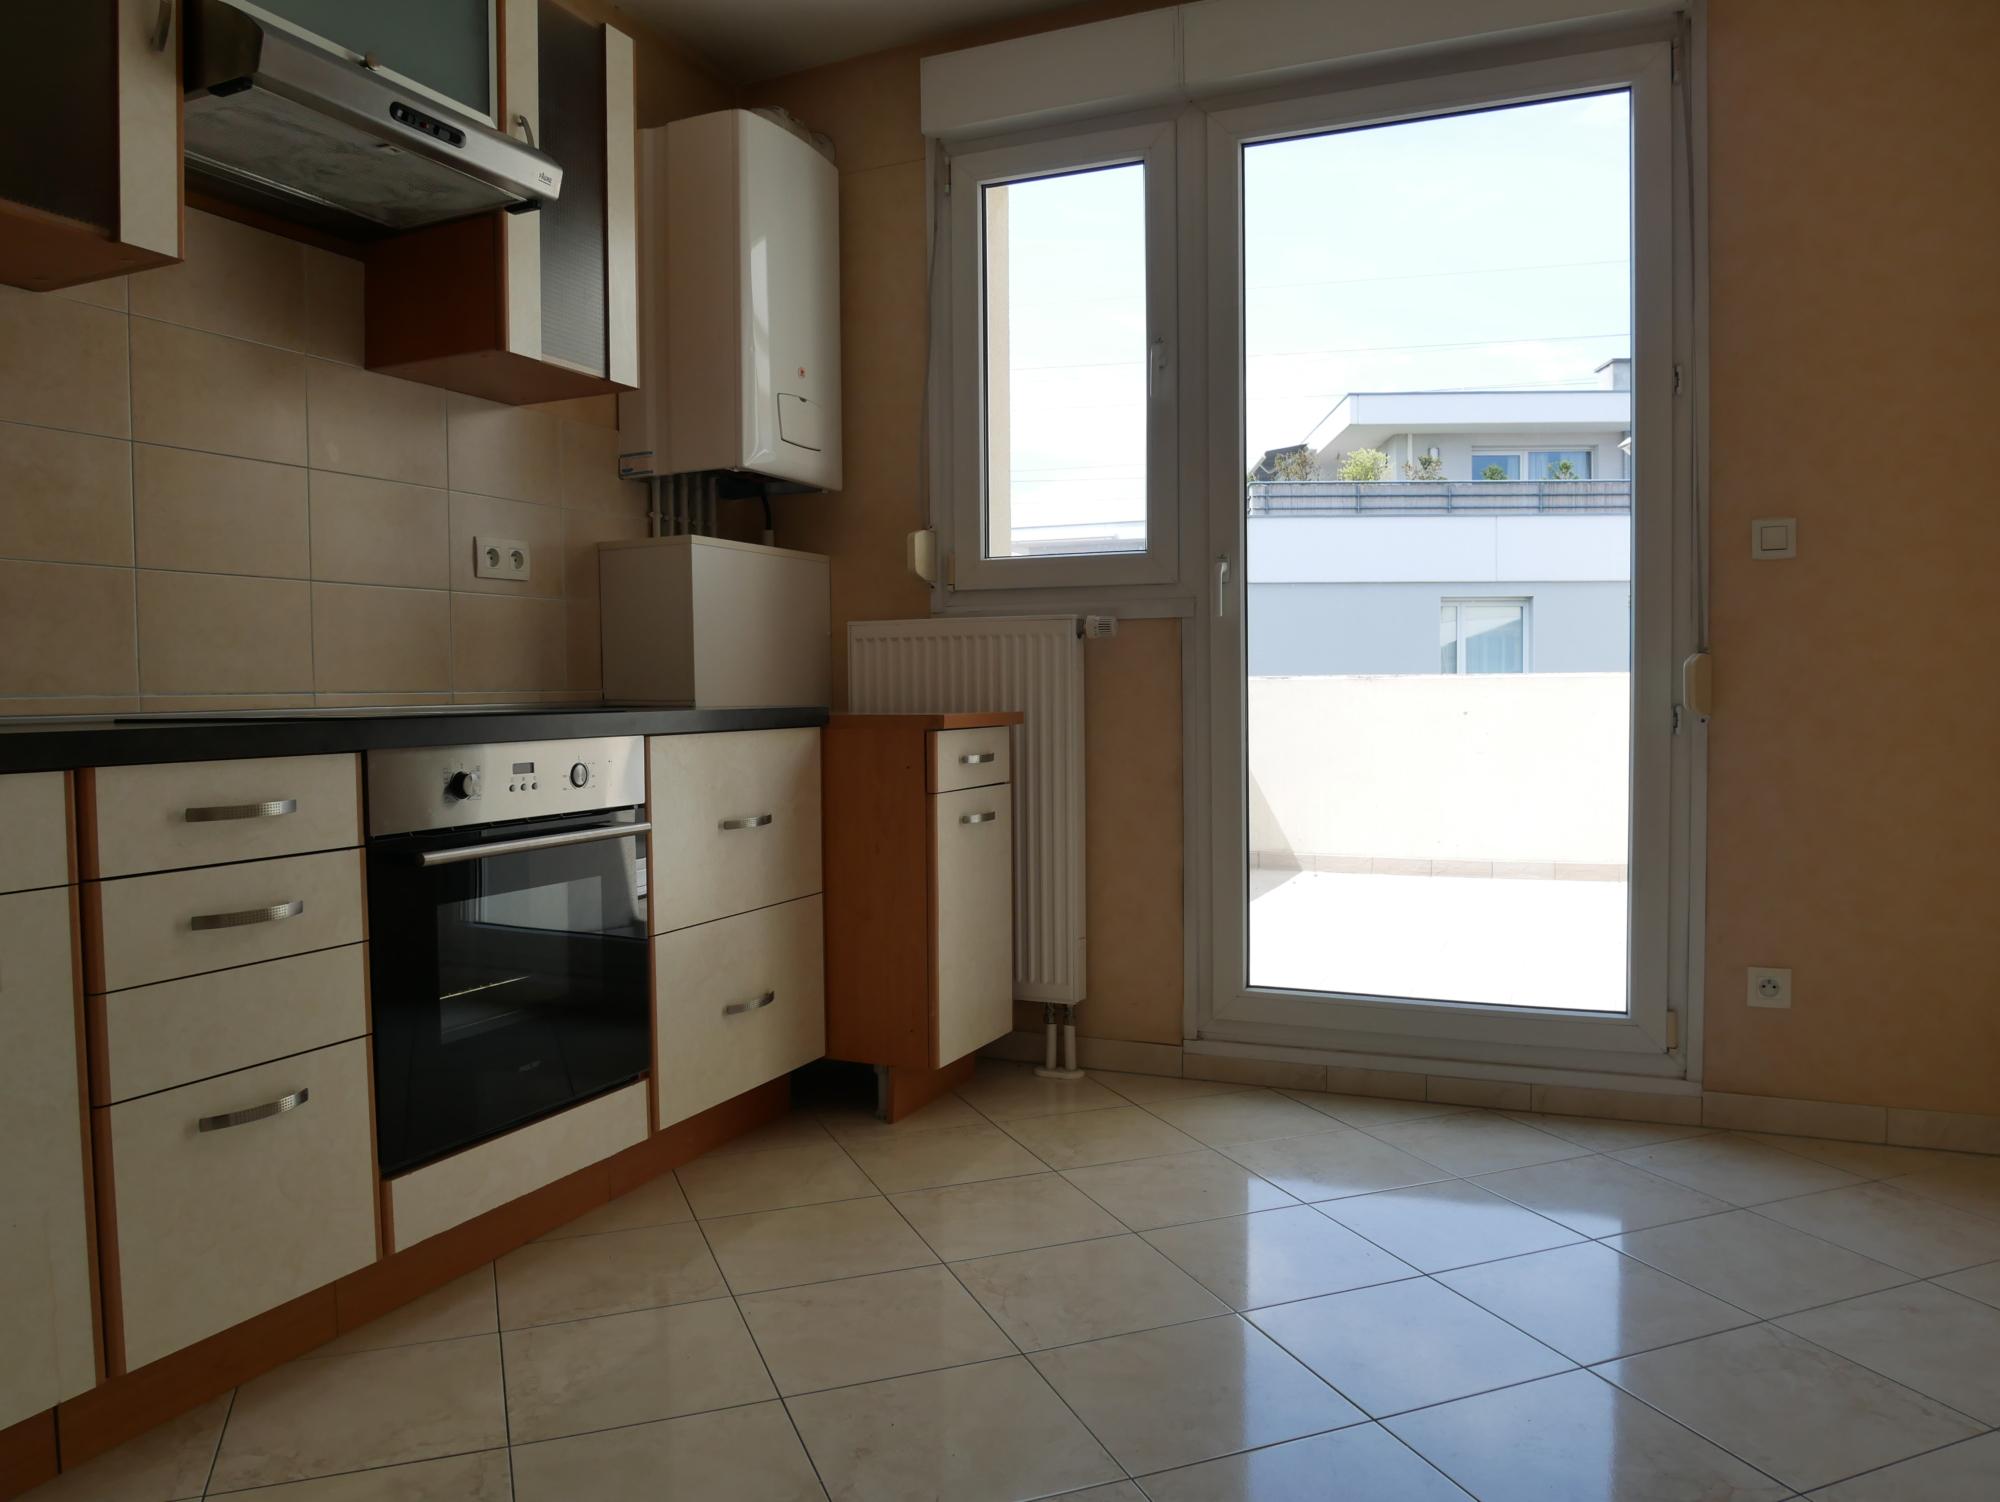 [Fresh] Lumineux 3 pièces avec balcon et parking - Souffelweyersheim - nos ventes - Beausite Immobilier 5